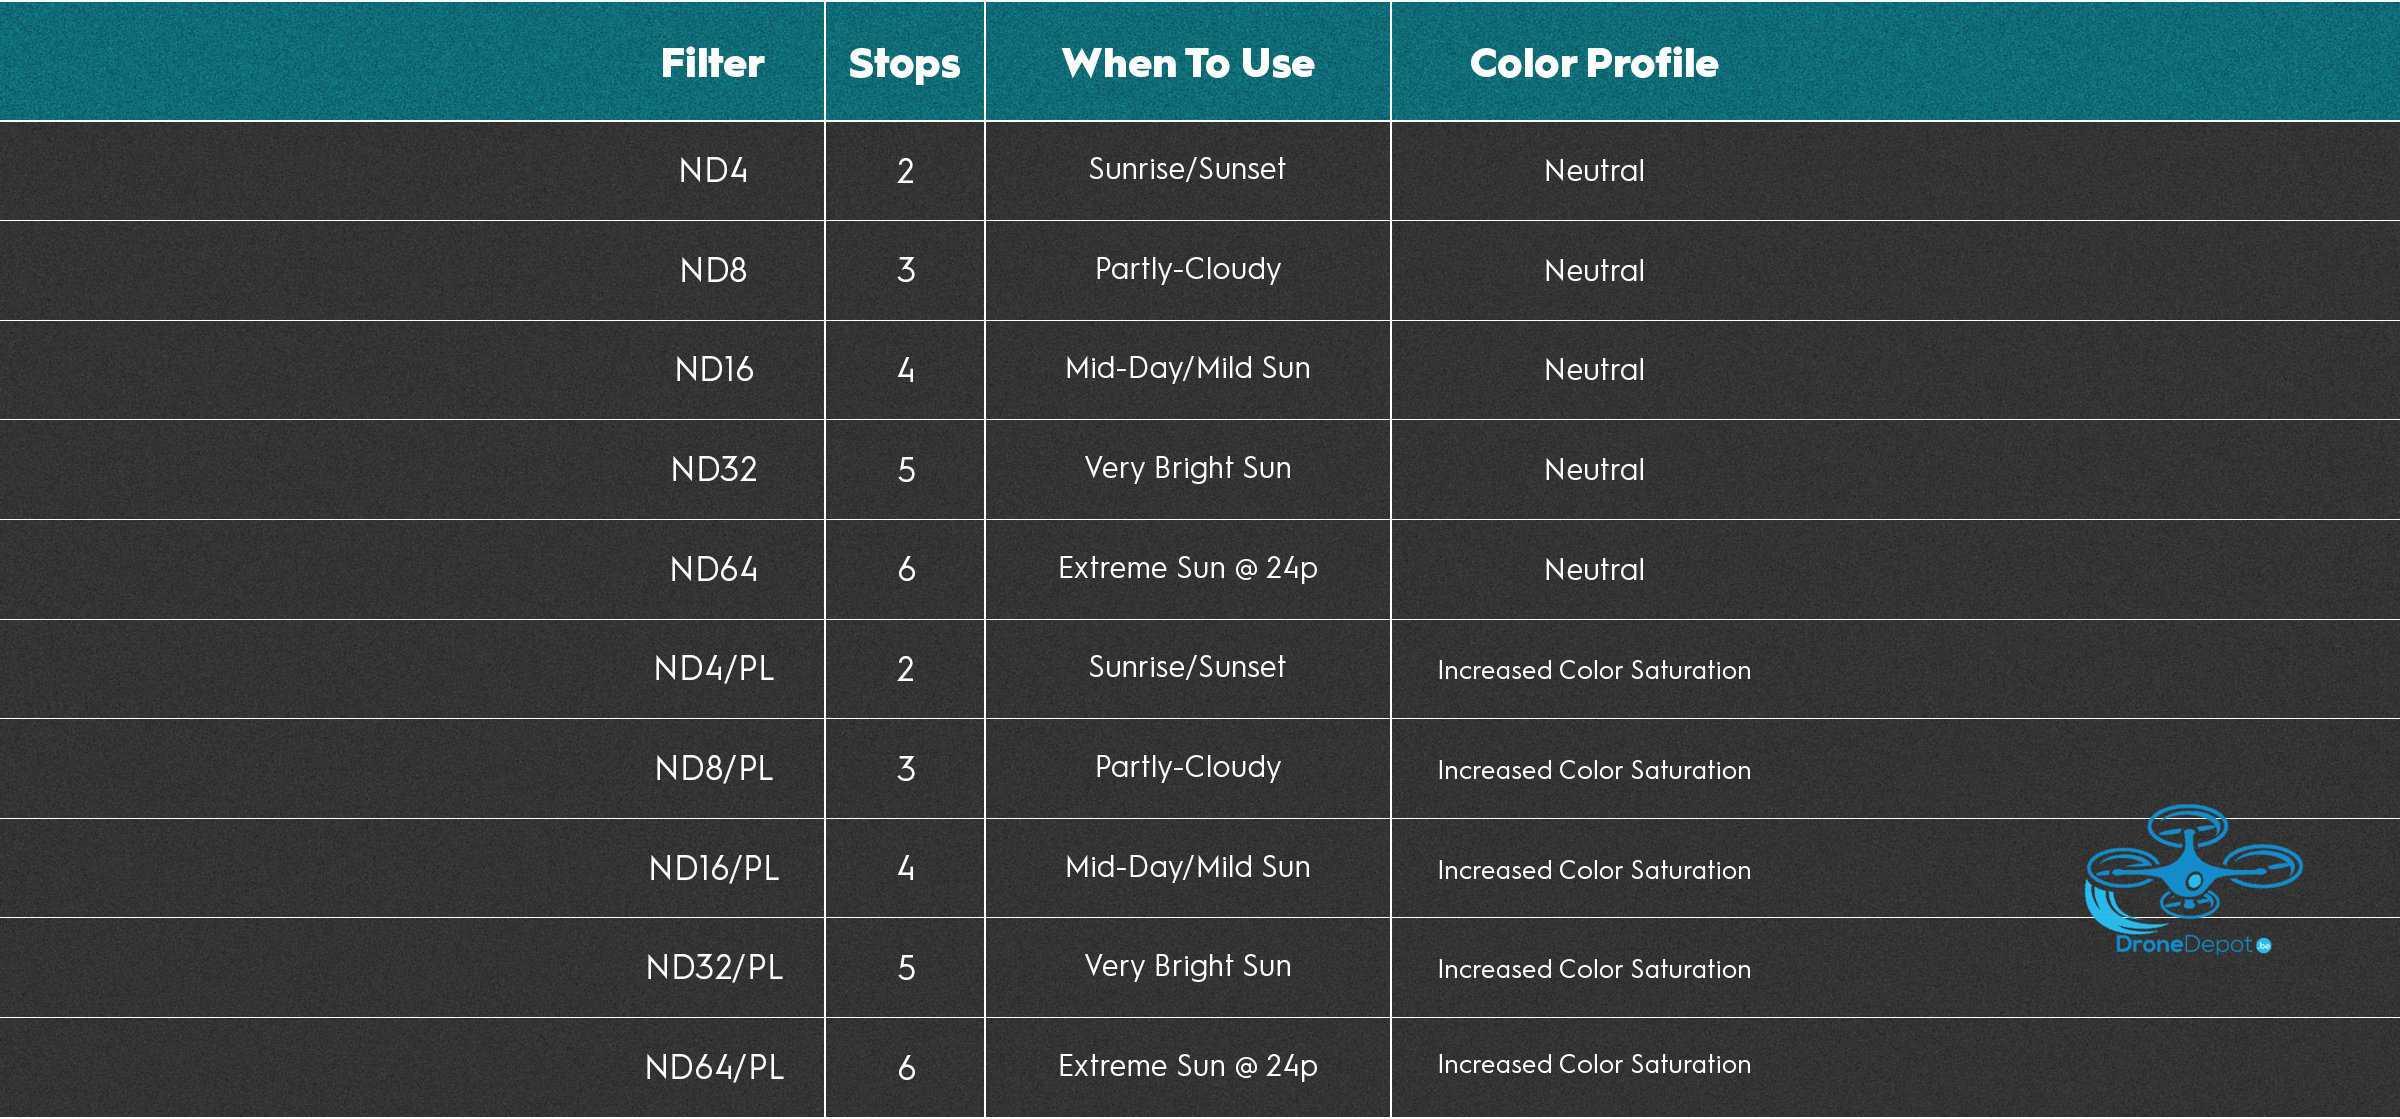 Polar Pro Dji Mavic Air Filters 6 Pack Dronedepot